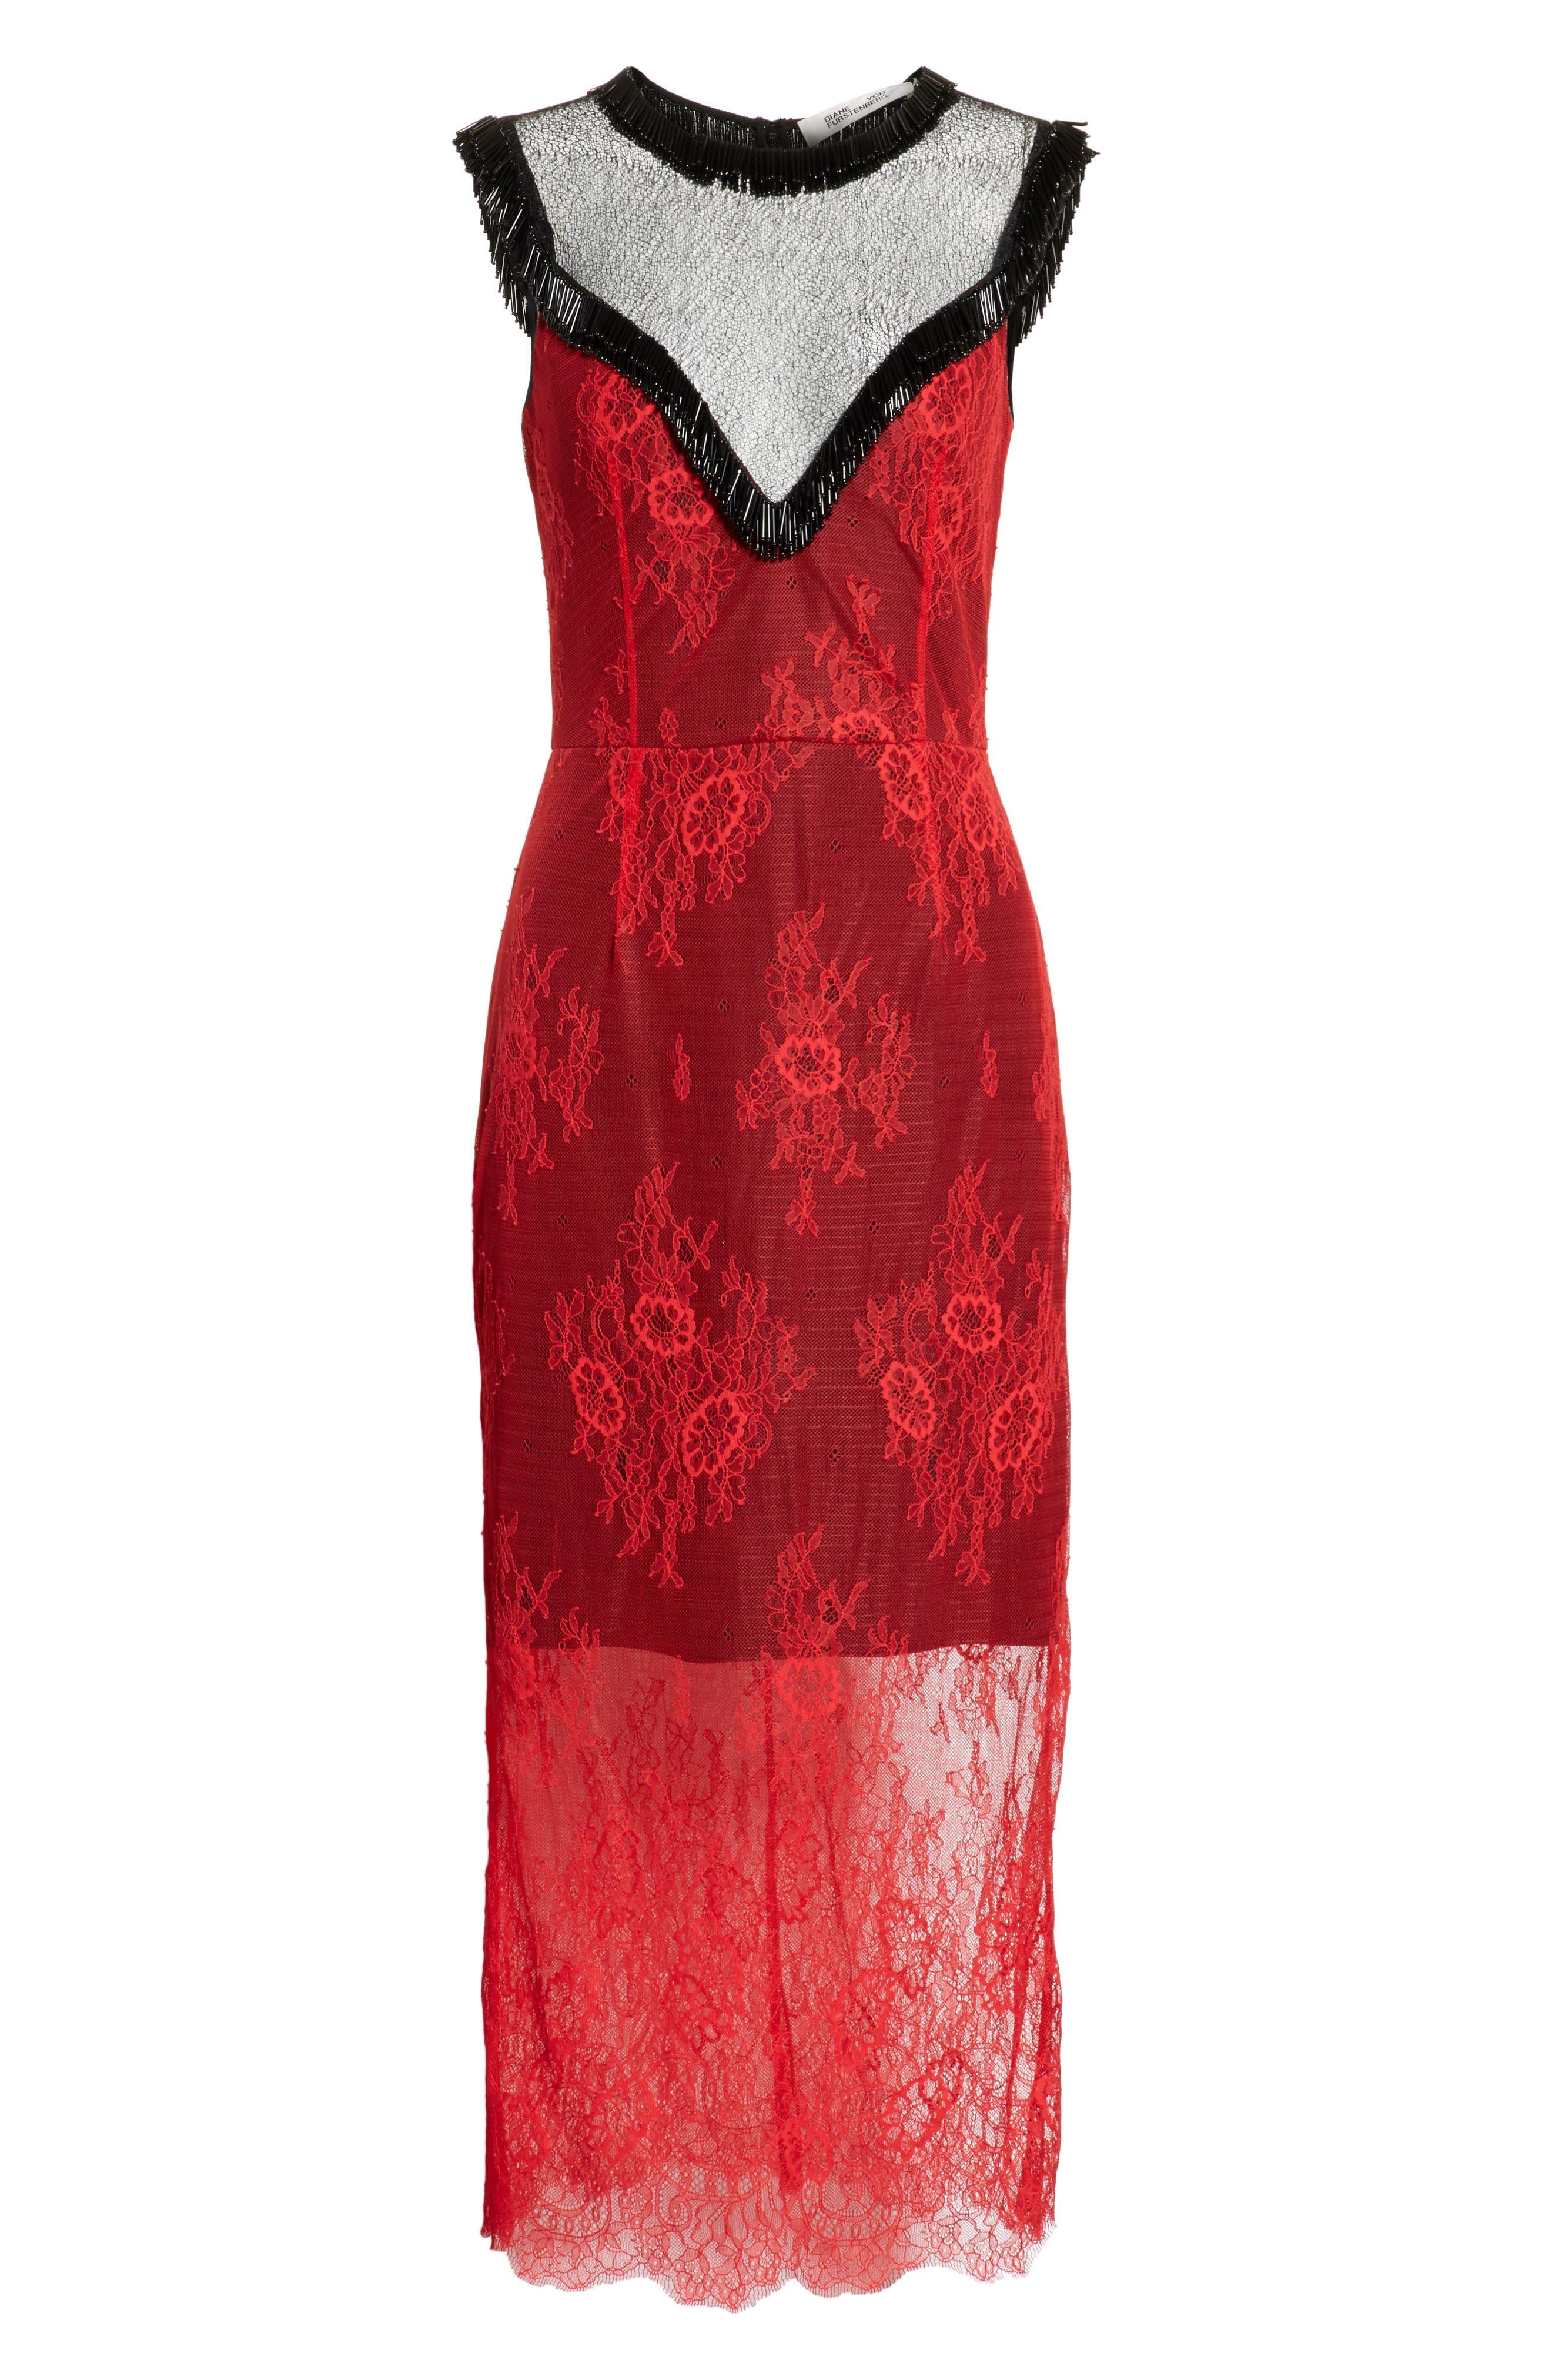 Diane von Furstenberg Beaded Lace Overlay Dress,                             Alternate thumbnail 6, color,